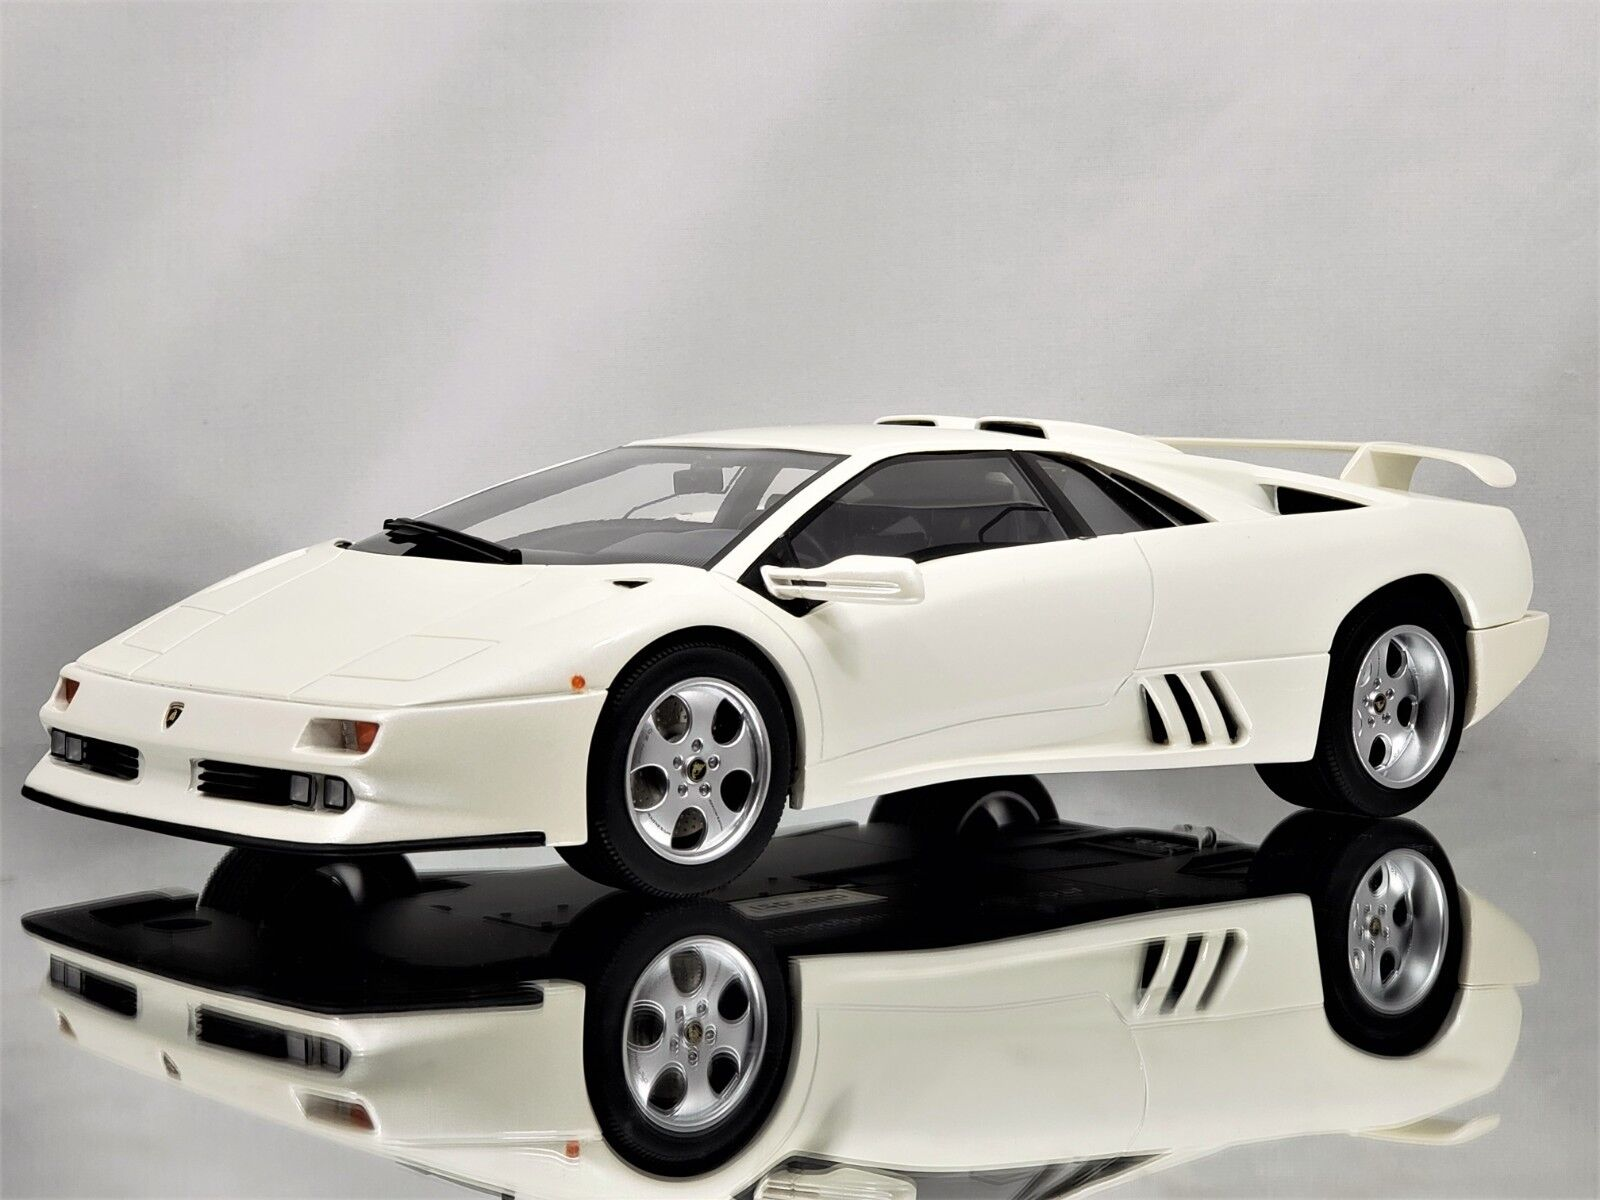 GT anda   Kyosho Lamborghini Diablo Jota SE30 vit hkonsts modellllerler Bil 1 18